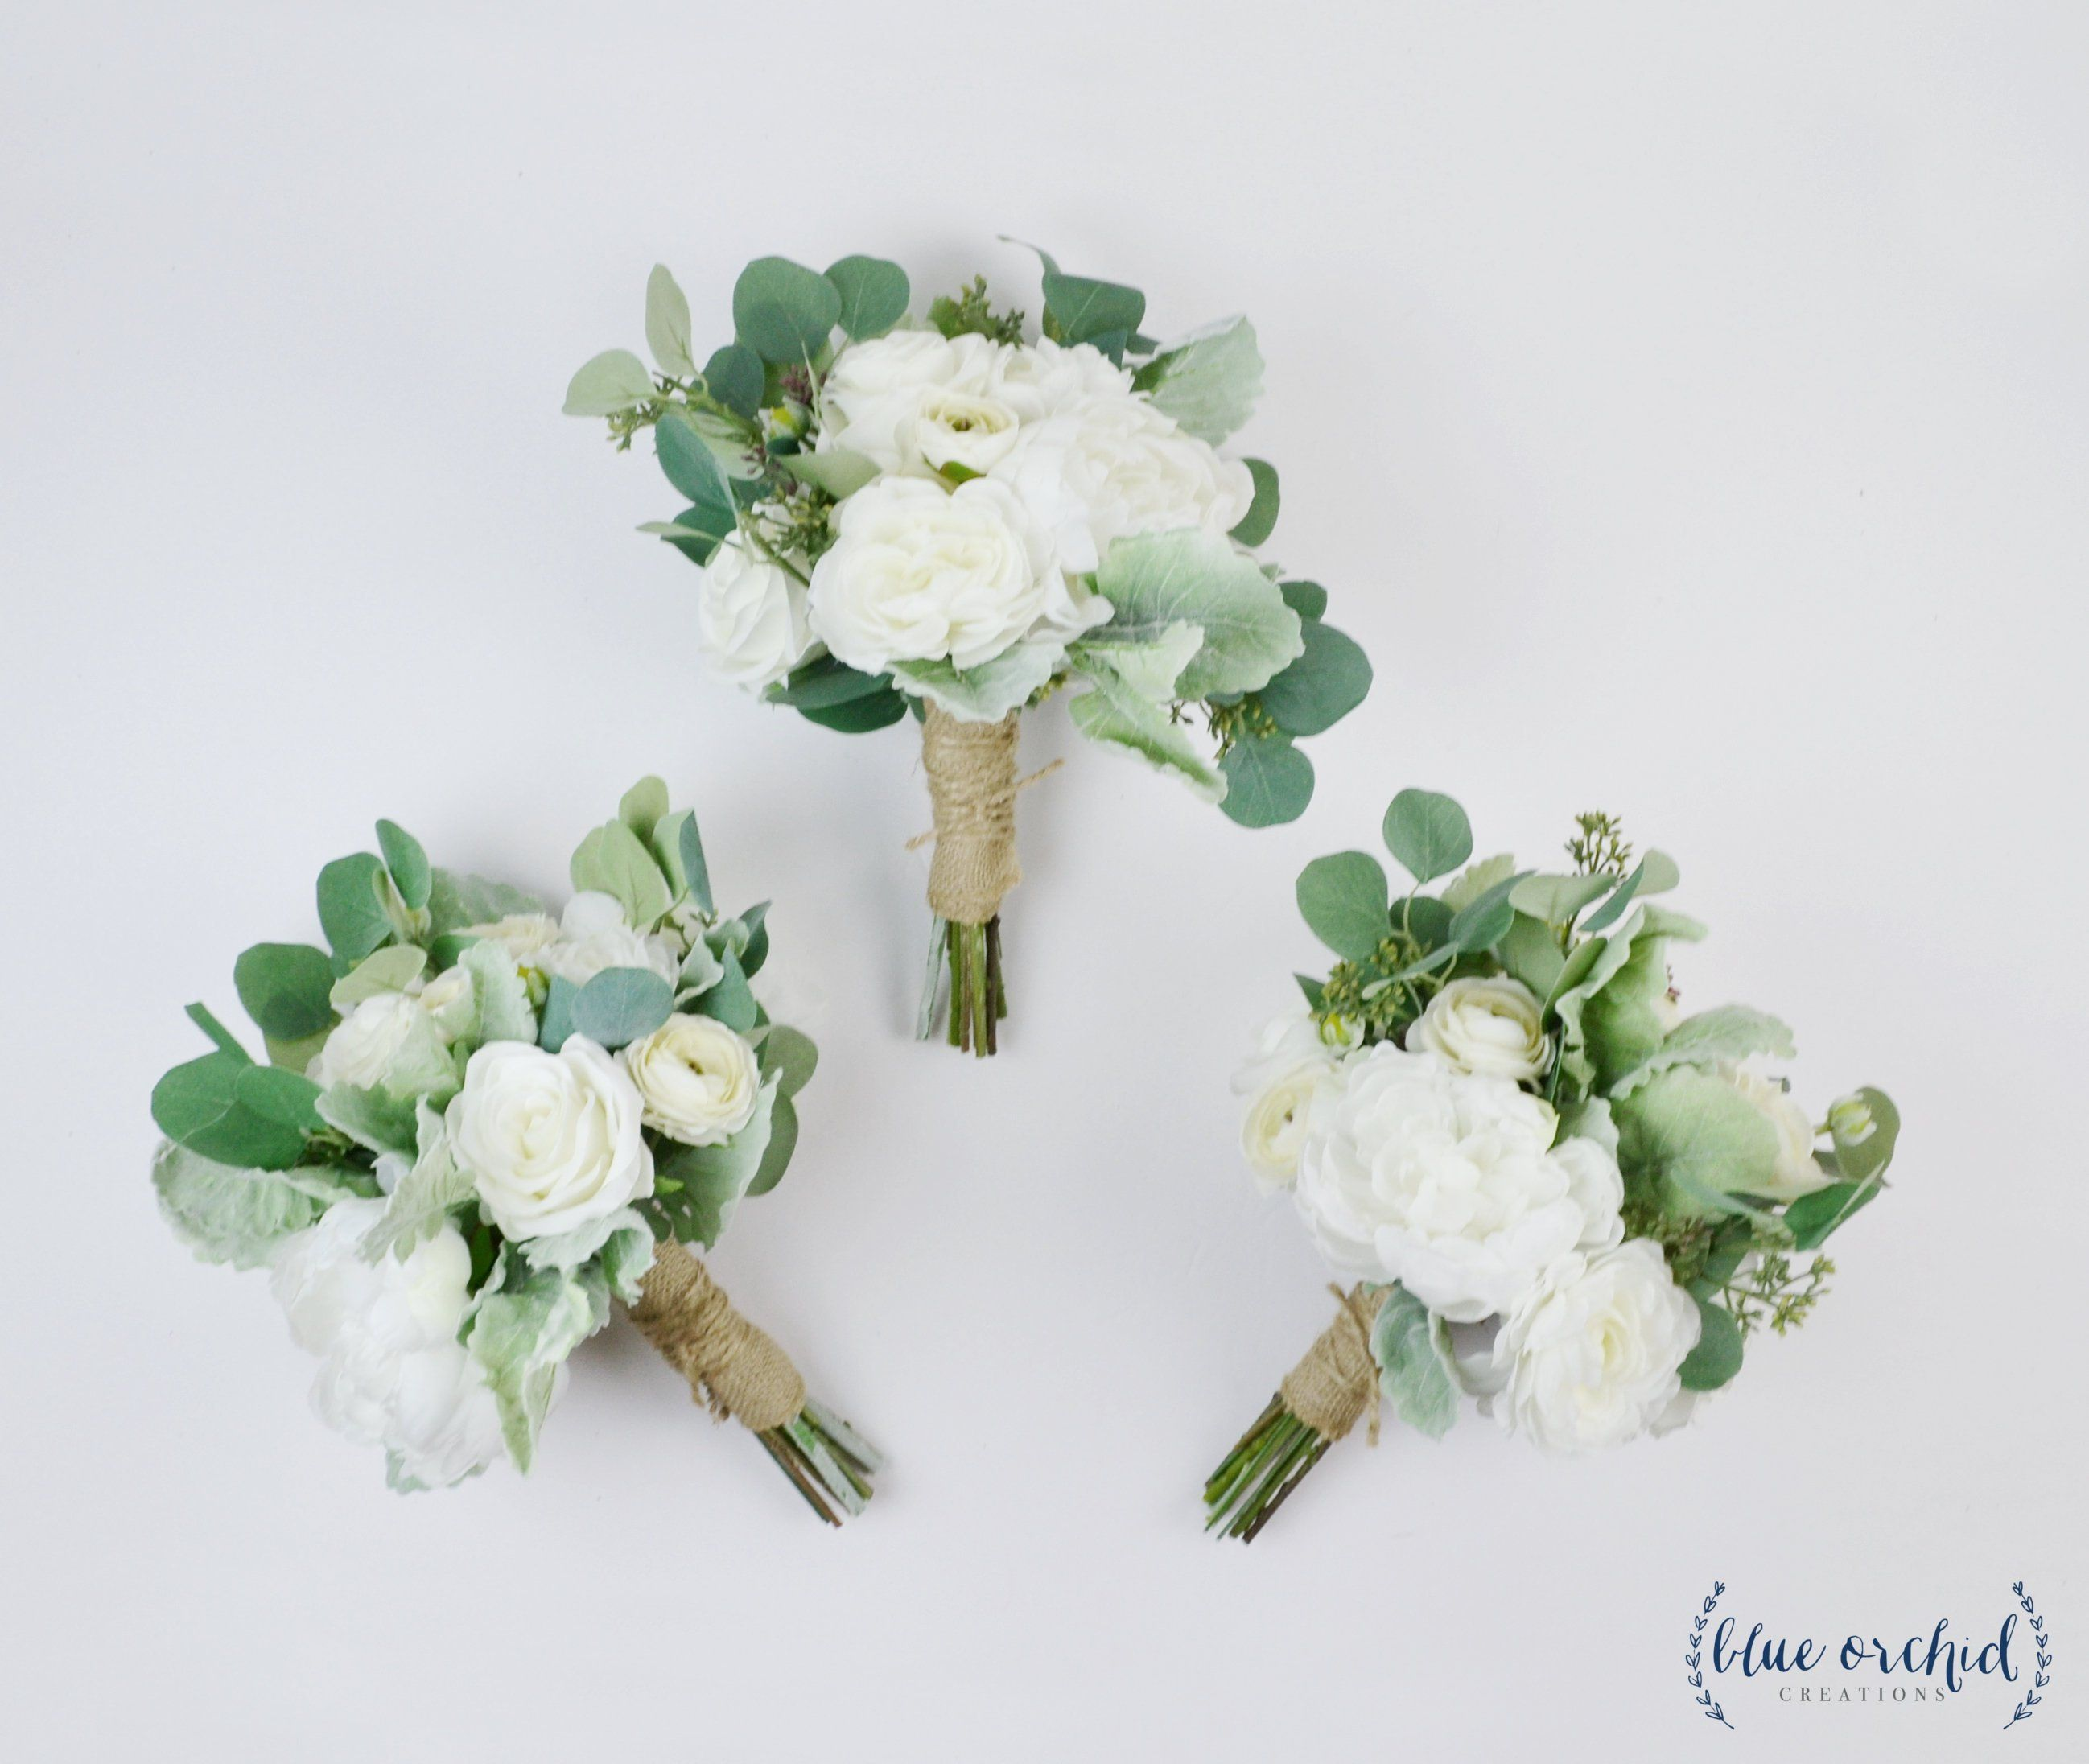 Wedding Flowers Wedding Bouquet Bridesmaid Bouquet Silk Etsy Flower Bouquet Wedding Bridal Bouquet Green Wedding Flowers